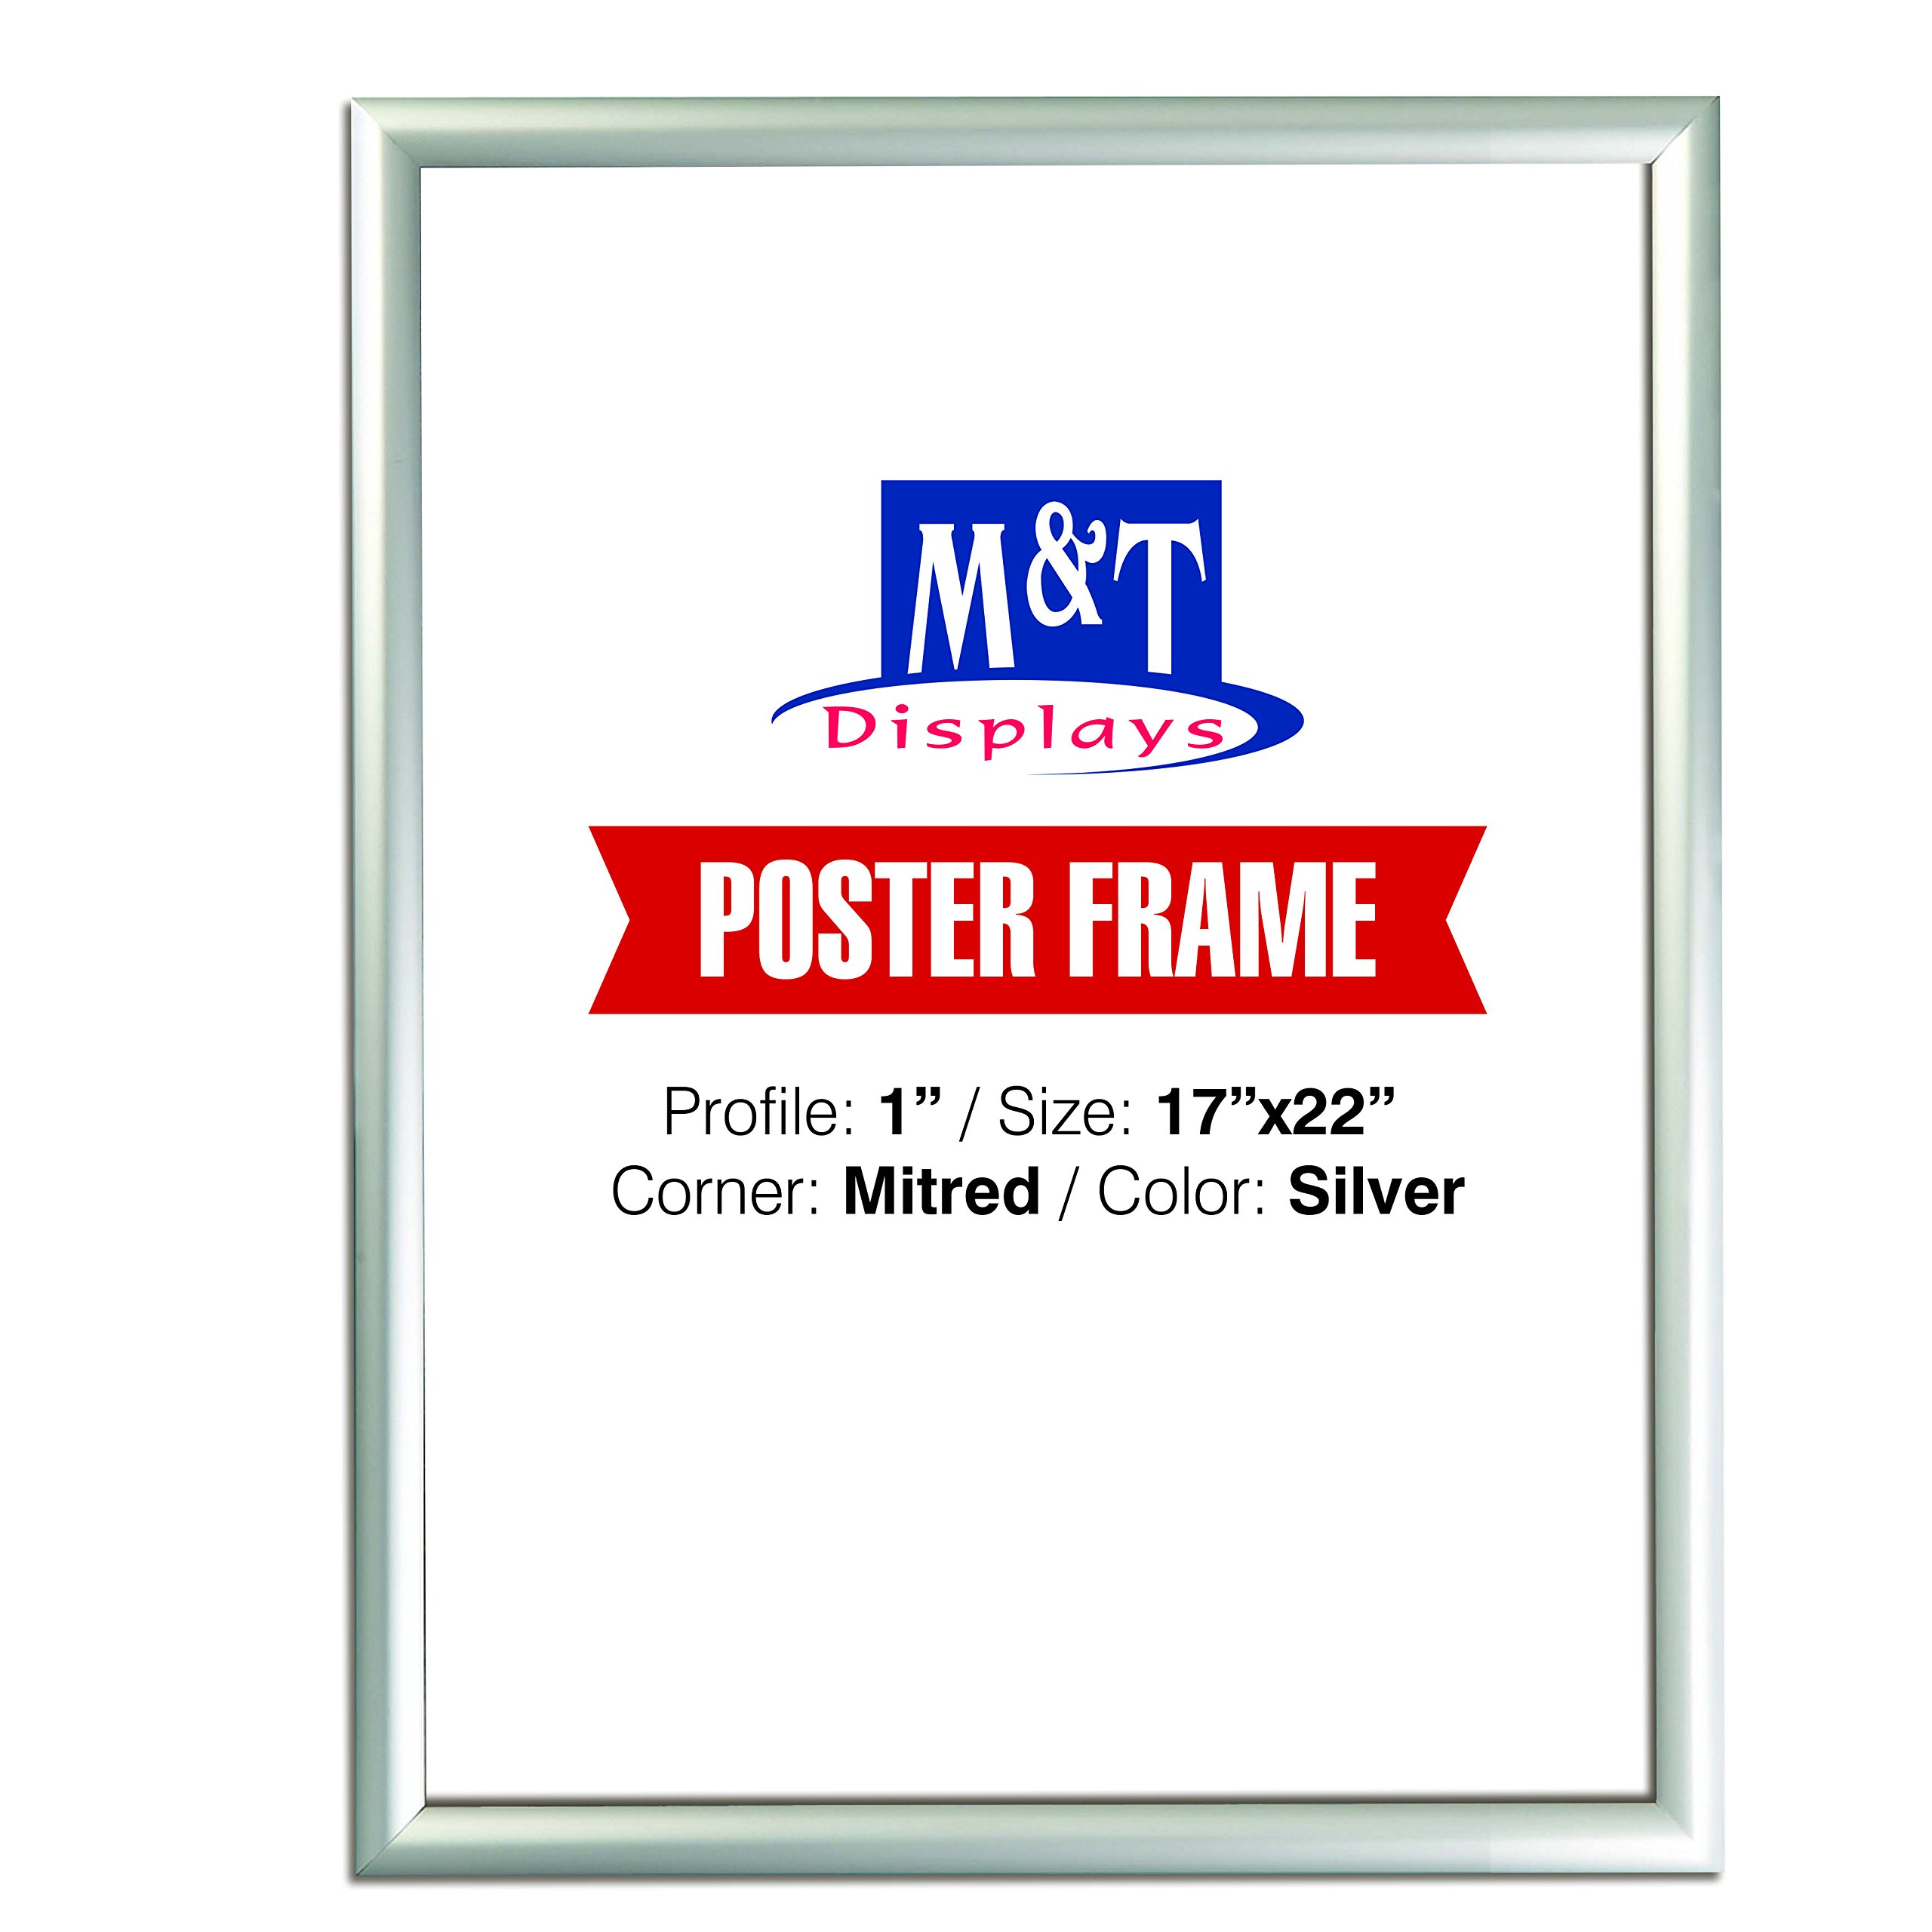 DisplaysMarket Snap Frame, 17x22 Poster Size 1'' Silver Color Profile, Mitred Corner, Silver, 1'' Mitred, Front Loading by DisplaysMarket